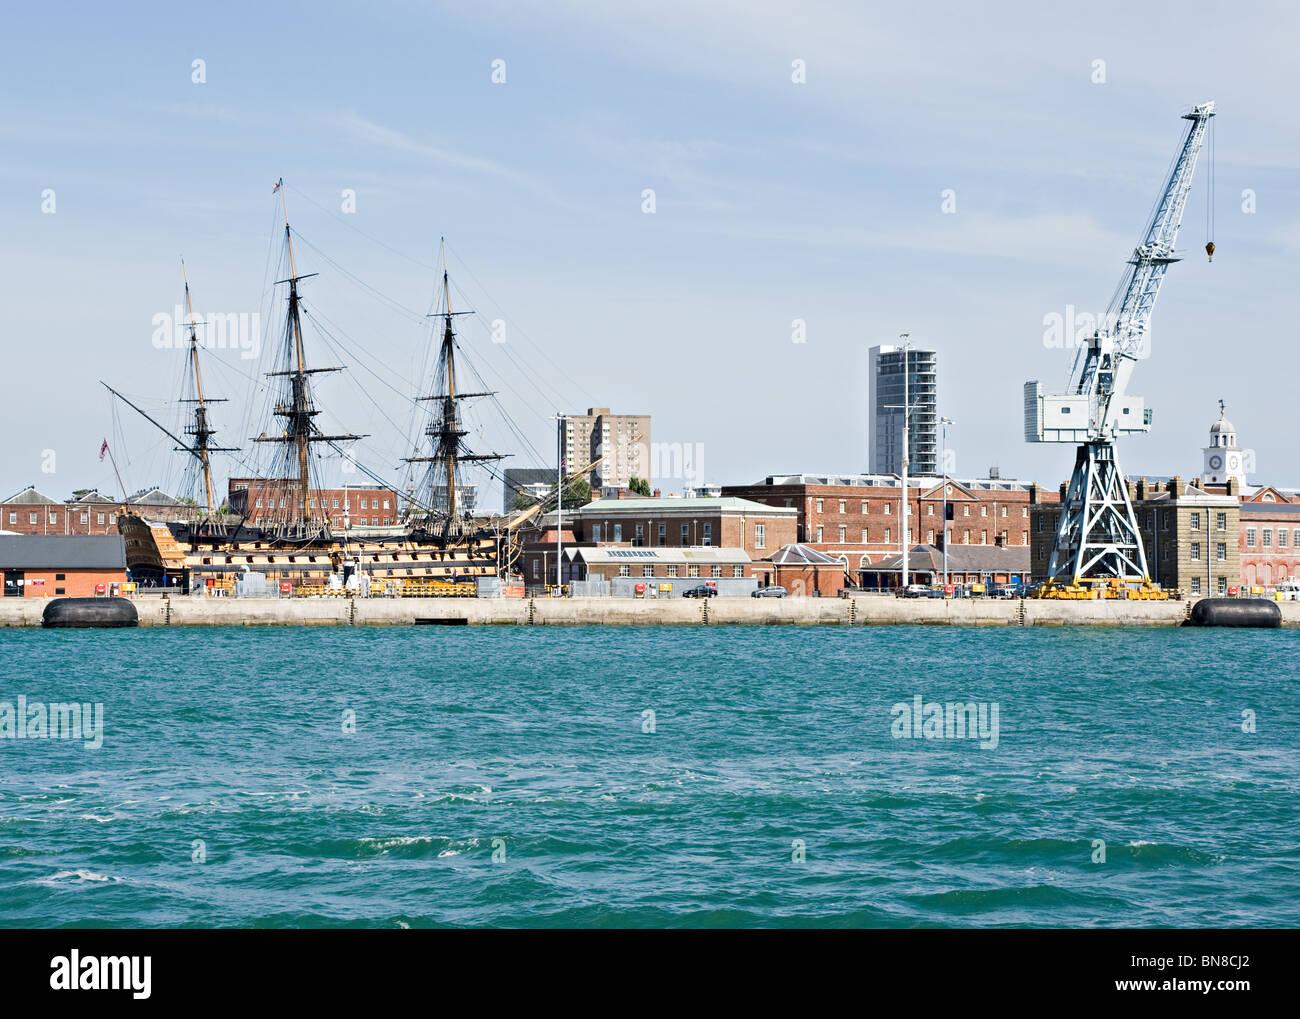 British Royal Navy Historic Warship HMS Victory at Portsmouth Naval Dockyard With Dockside Crane England United Stock Photo